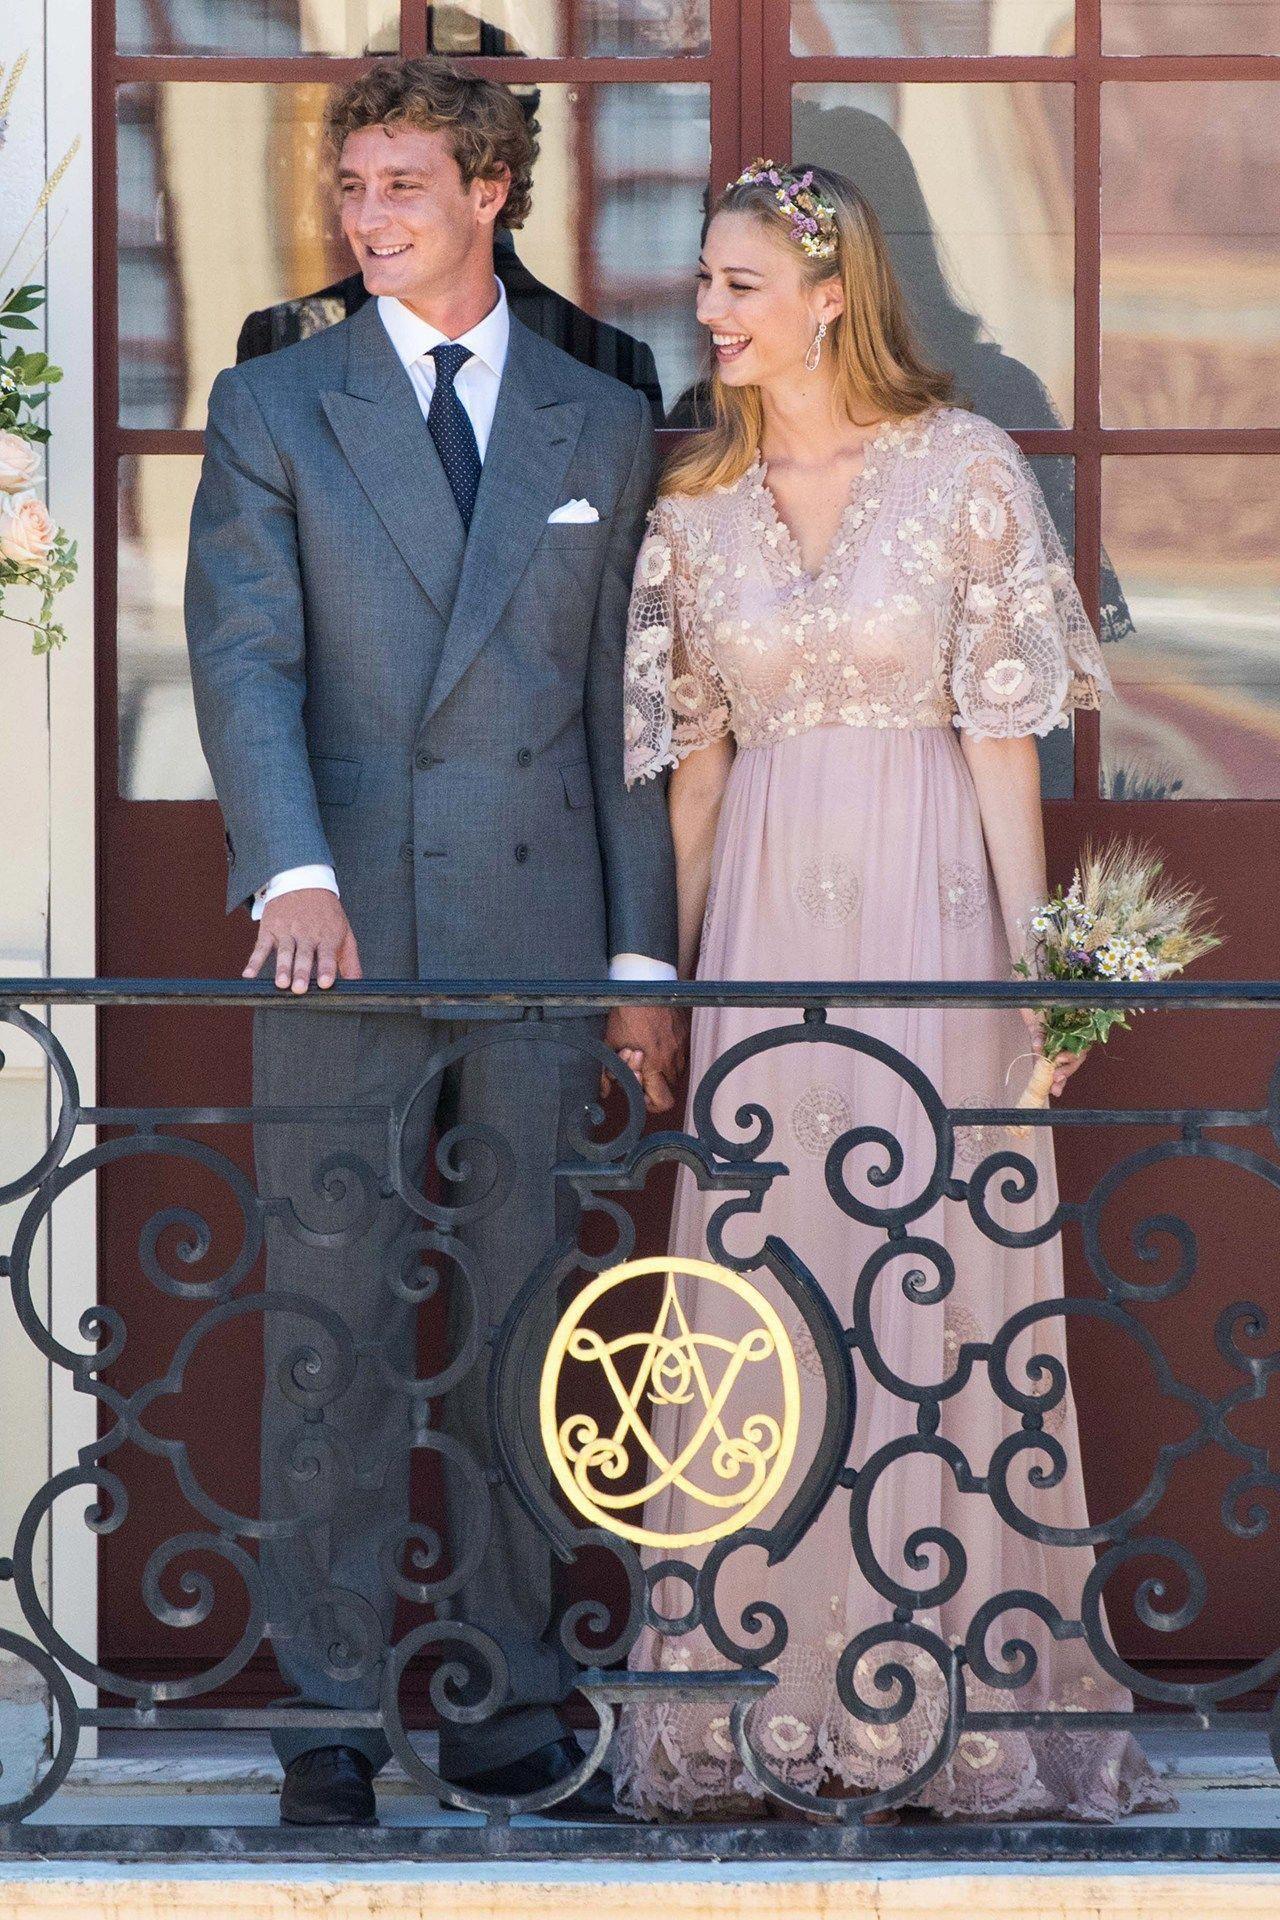 Beatrice Borromeo Pierre Casiraghi Wedding Valentino Dress Vogue Co Uk Valentino Celebrity Bride Royal Wedding Dress Valentino Wedding Dress